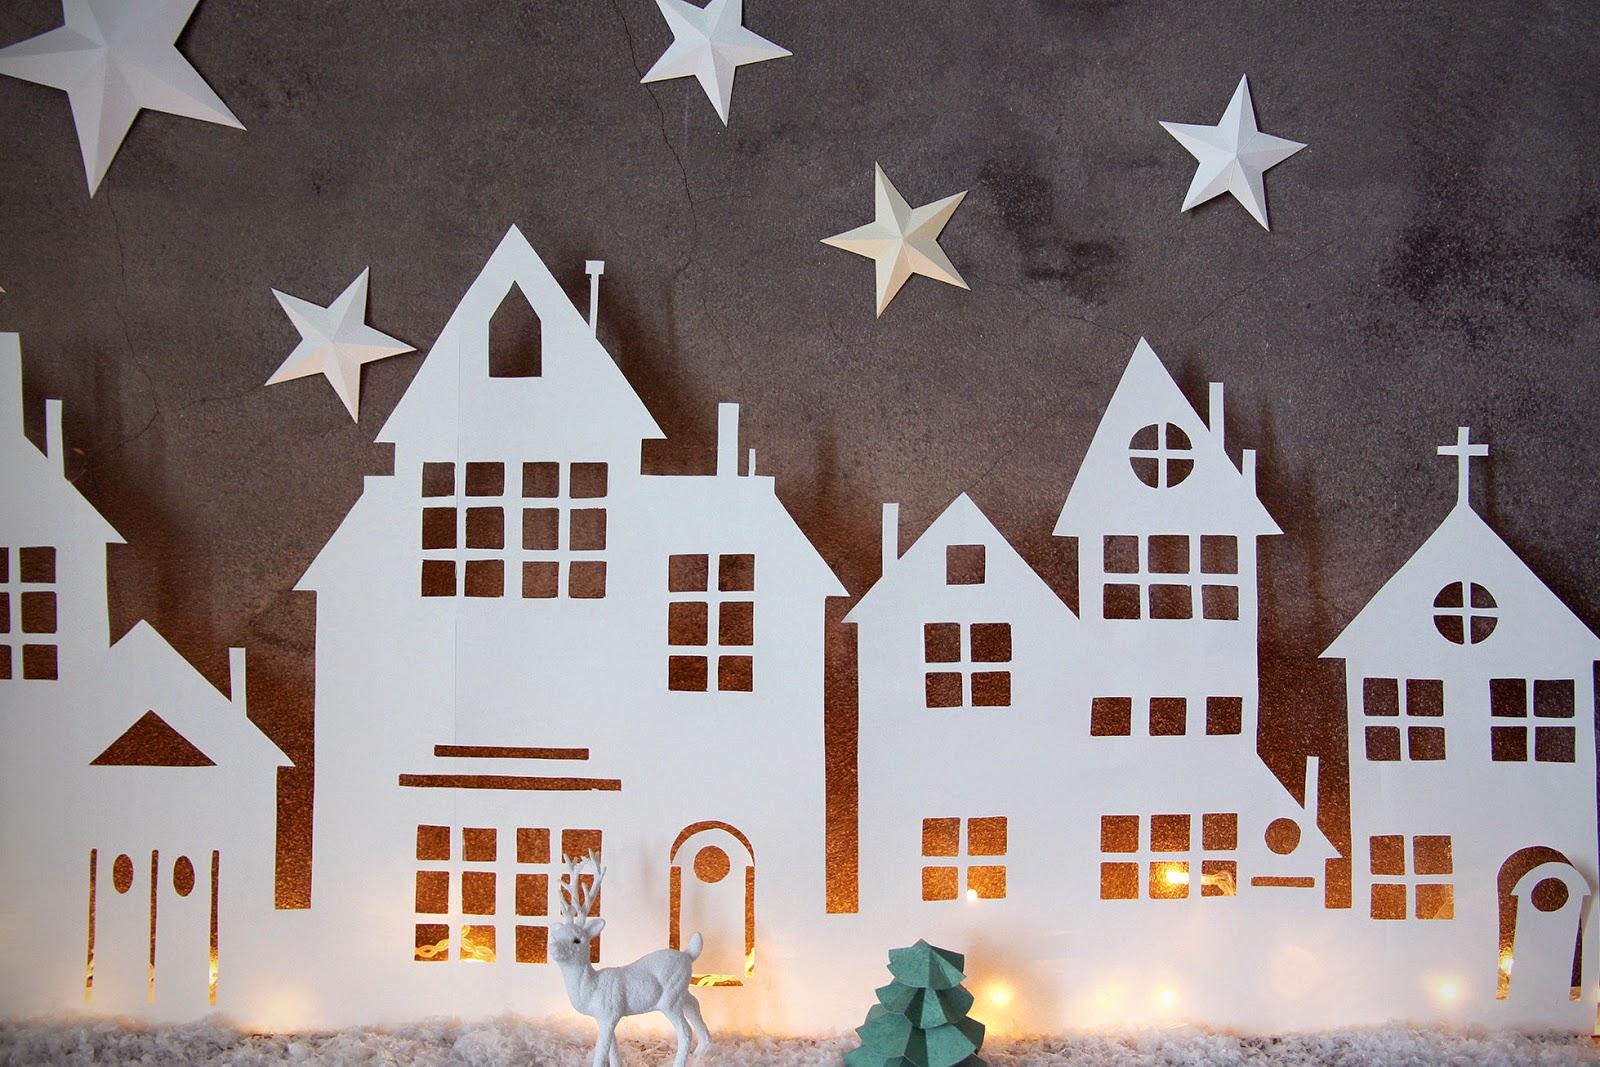 #AA5E22 DIY :: VILLAGE LUMINEUX DE NOËL 6117 décoration de noel village 1600x1067 px @ aertt.com